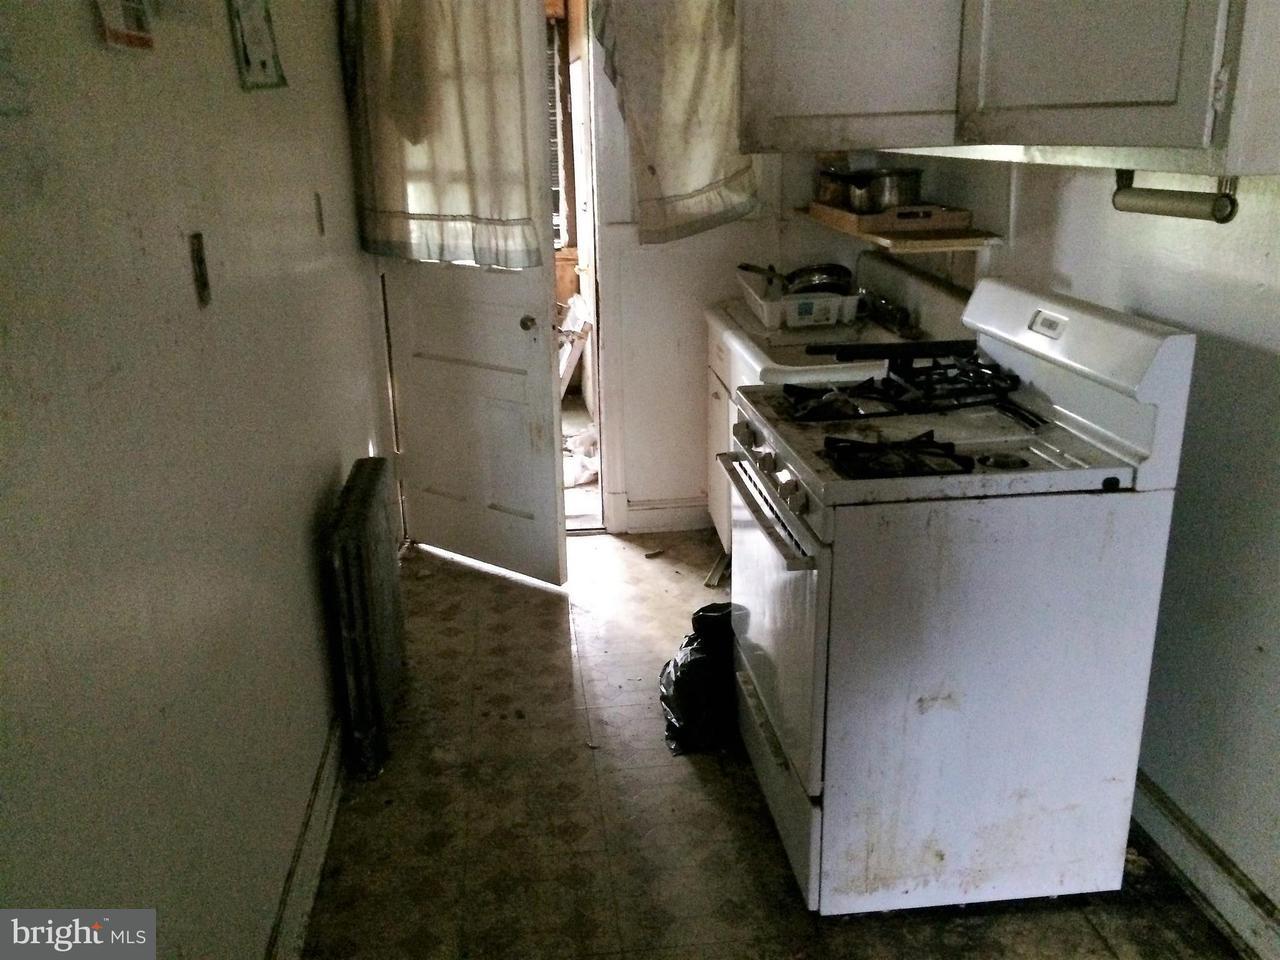 Additional photo for property listing at 1625 17th Pl Se 1625 17th Pl Se Washington, Округ Колумбия 20020 Соединенные Штаты